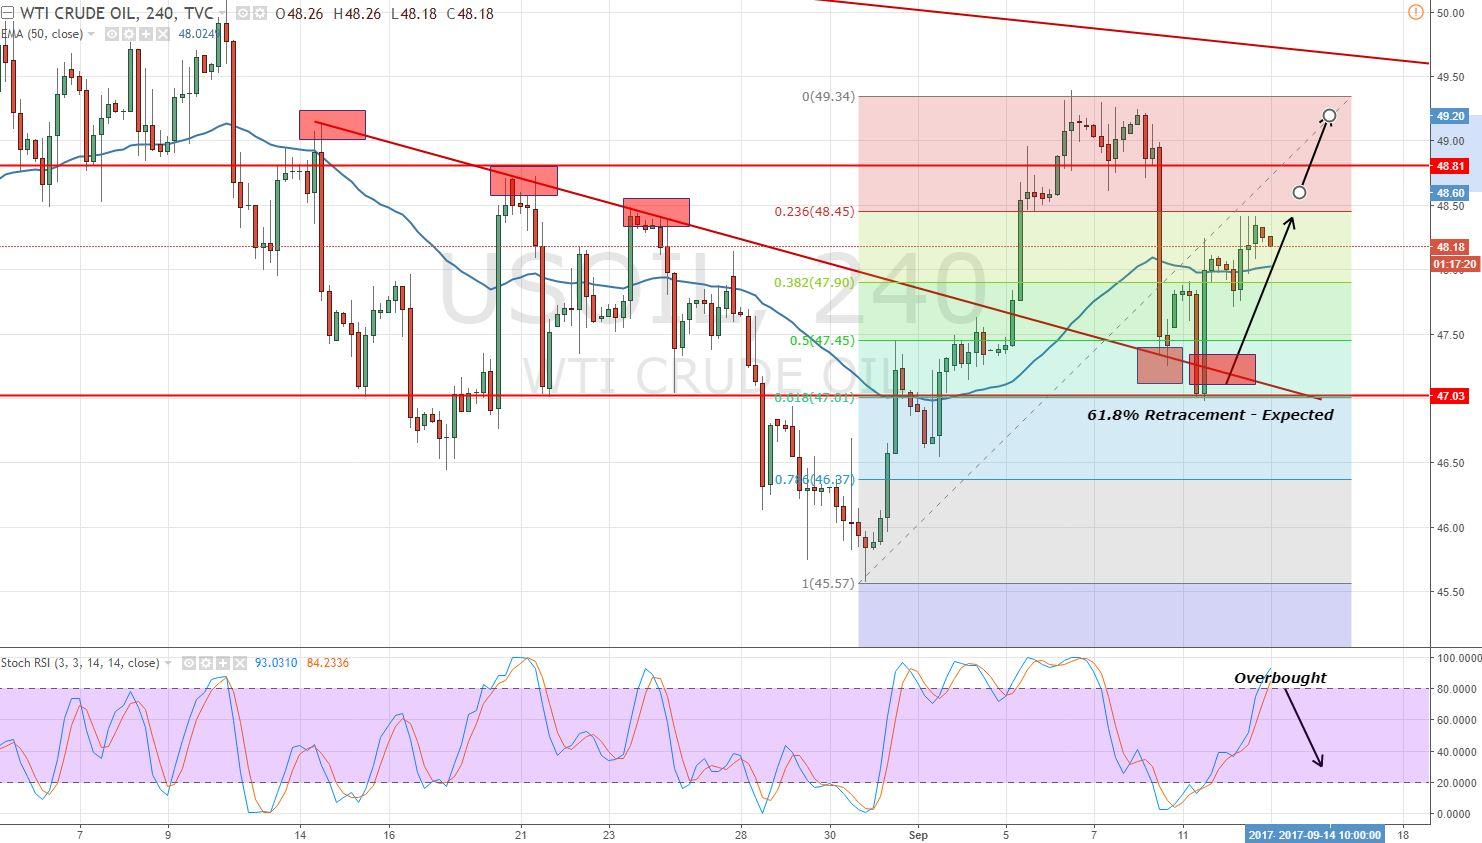 Crude Oil - Bullish Wave & Fibonacci Retracement